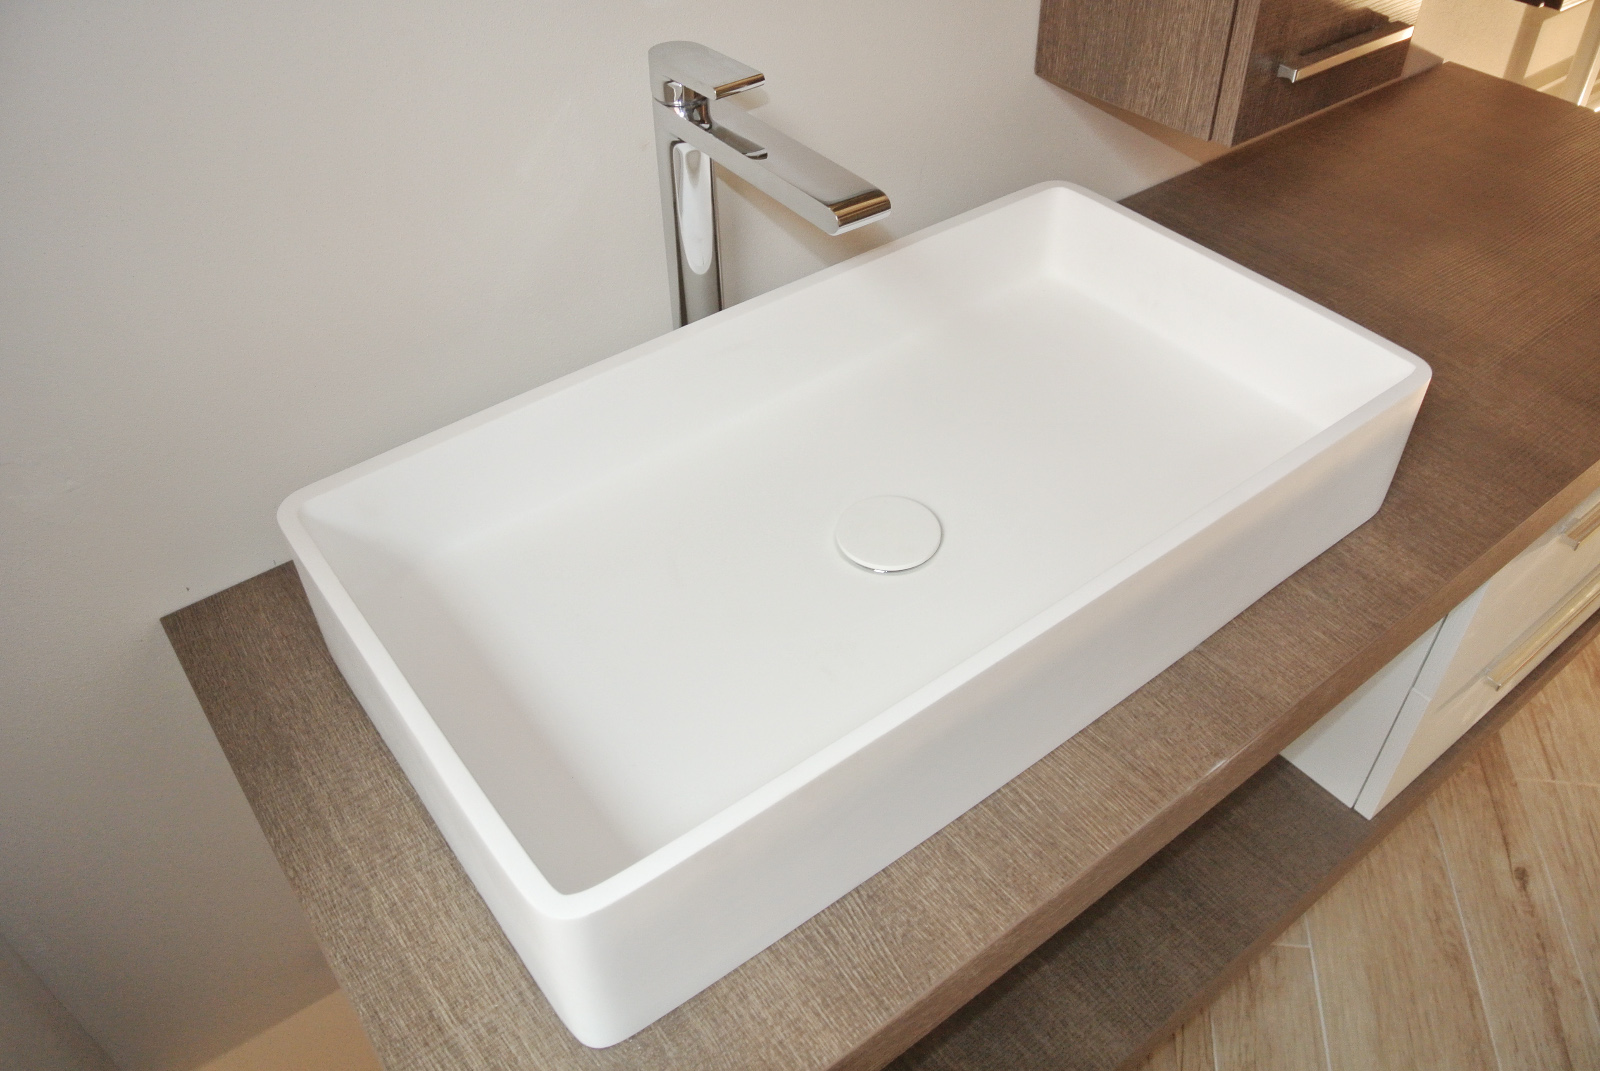 sintesibagno-verbania-arredobagno-lavabo-corian-miscelatore-lavabo-prolungato-bpnomi-bonny